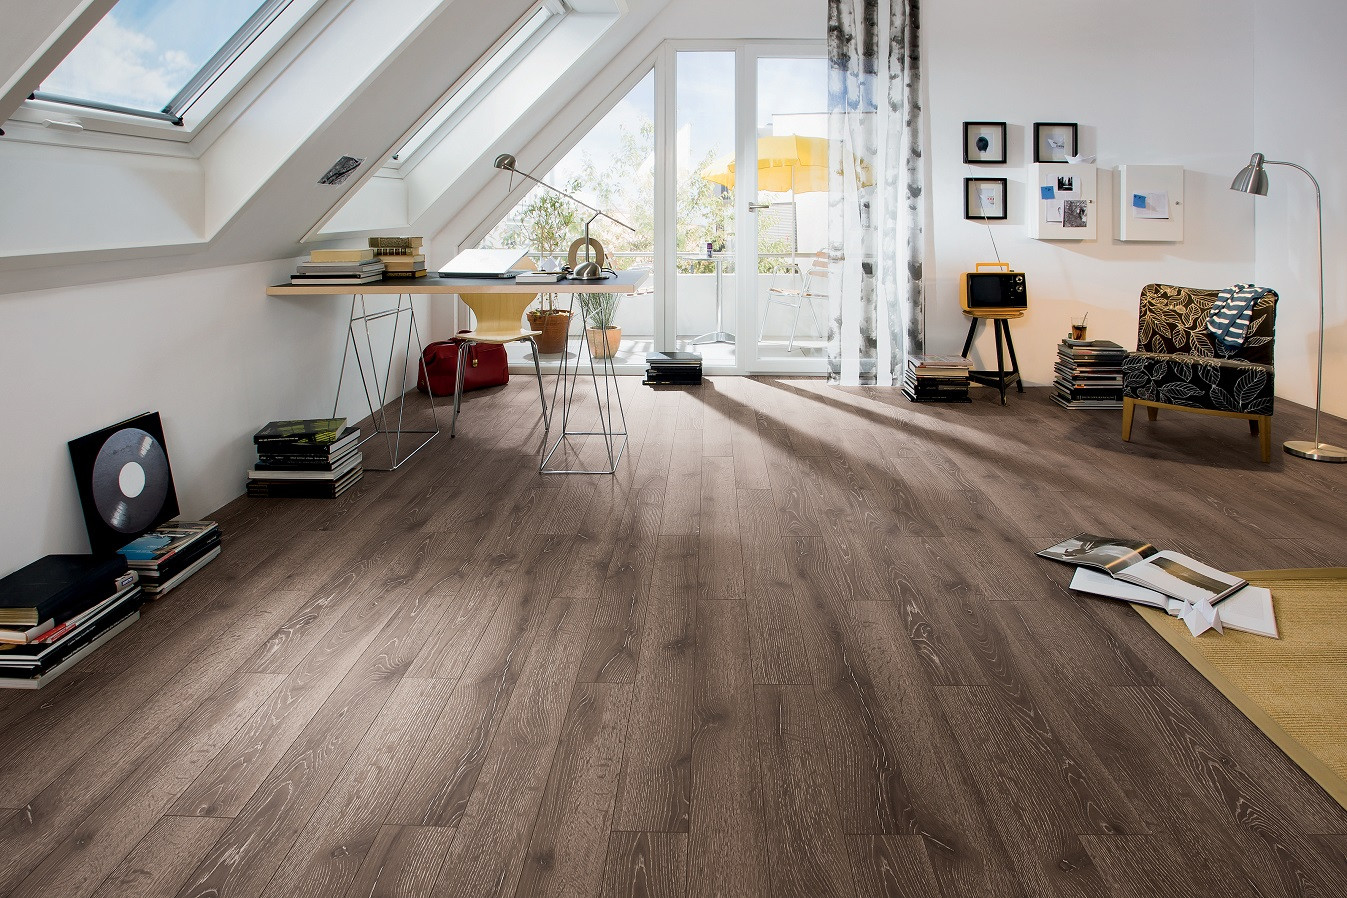 2 1 4 inch engineered hardwood flooring of ca laminate flooring california wood floor boards san jose los intended for ca best place to buy hardwood flooring